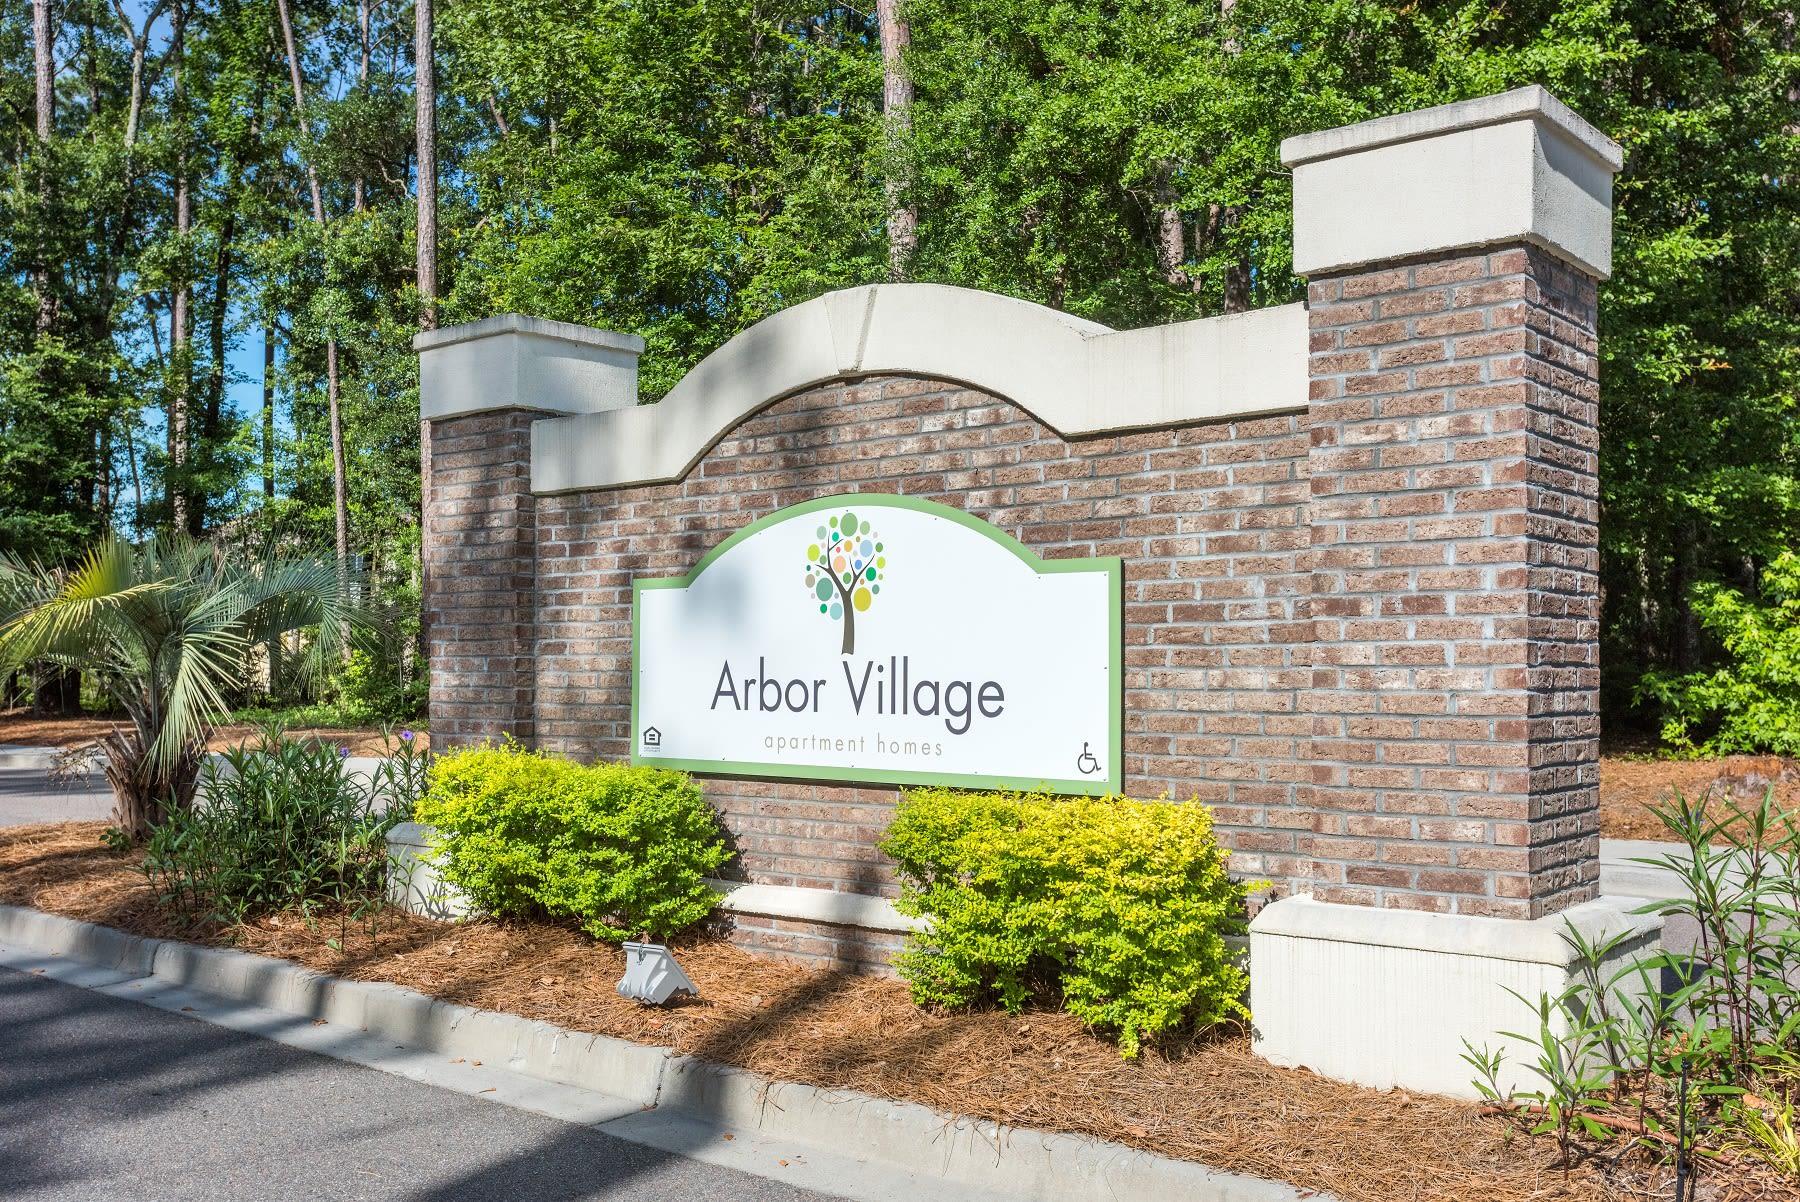 Entrance monument at Arbor Village in Summerville, South Carolina